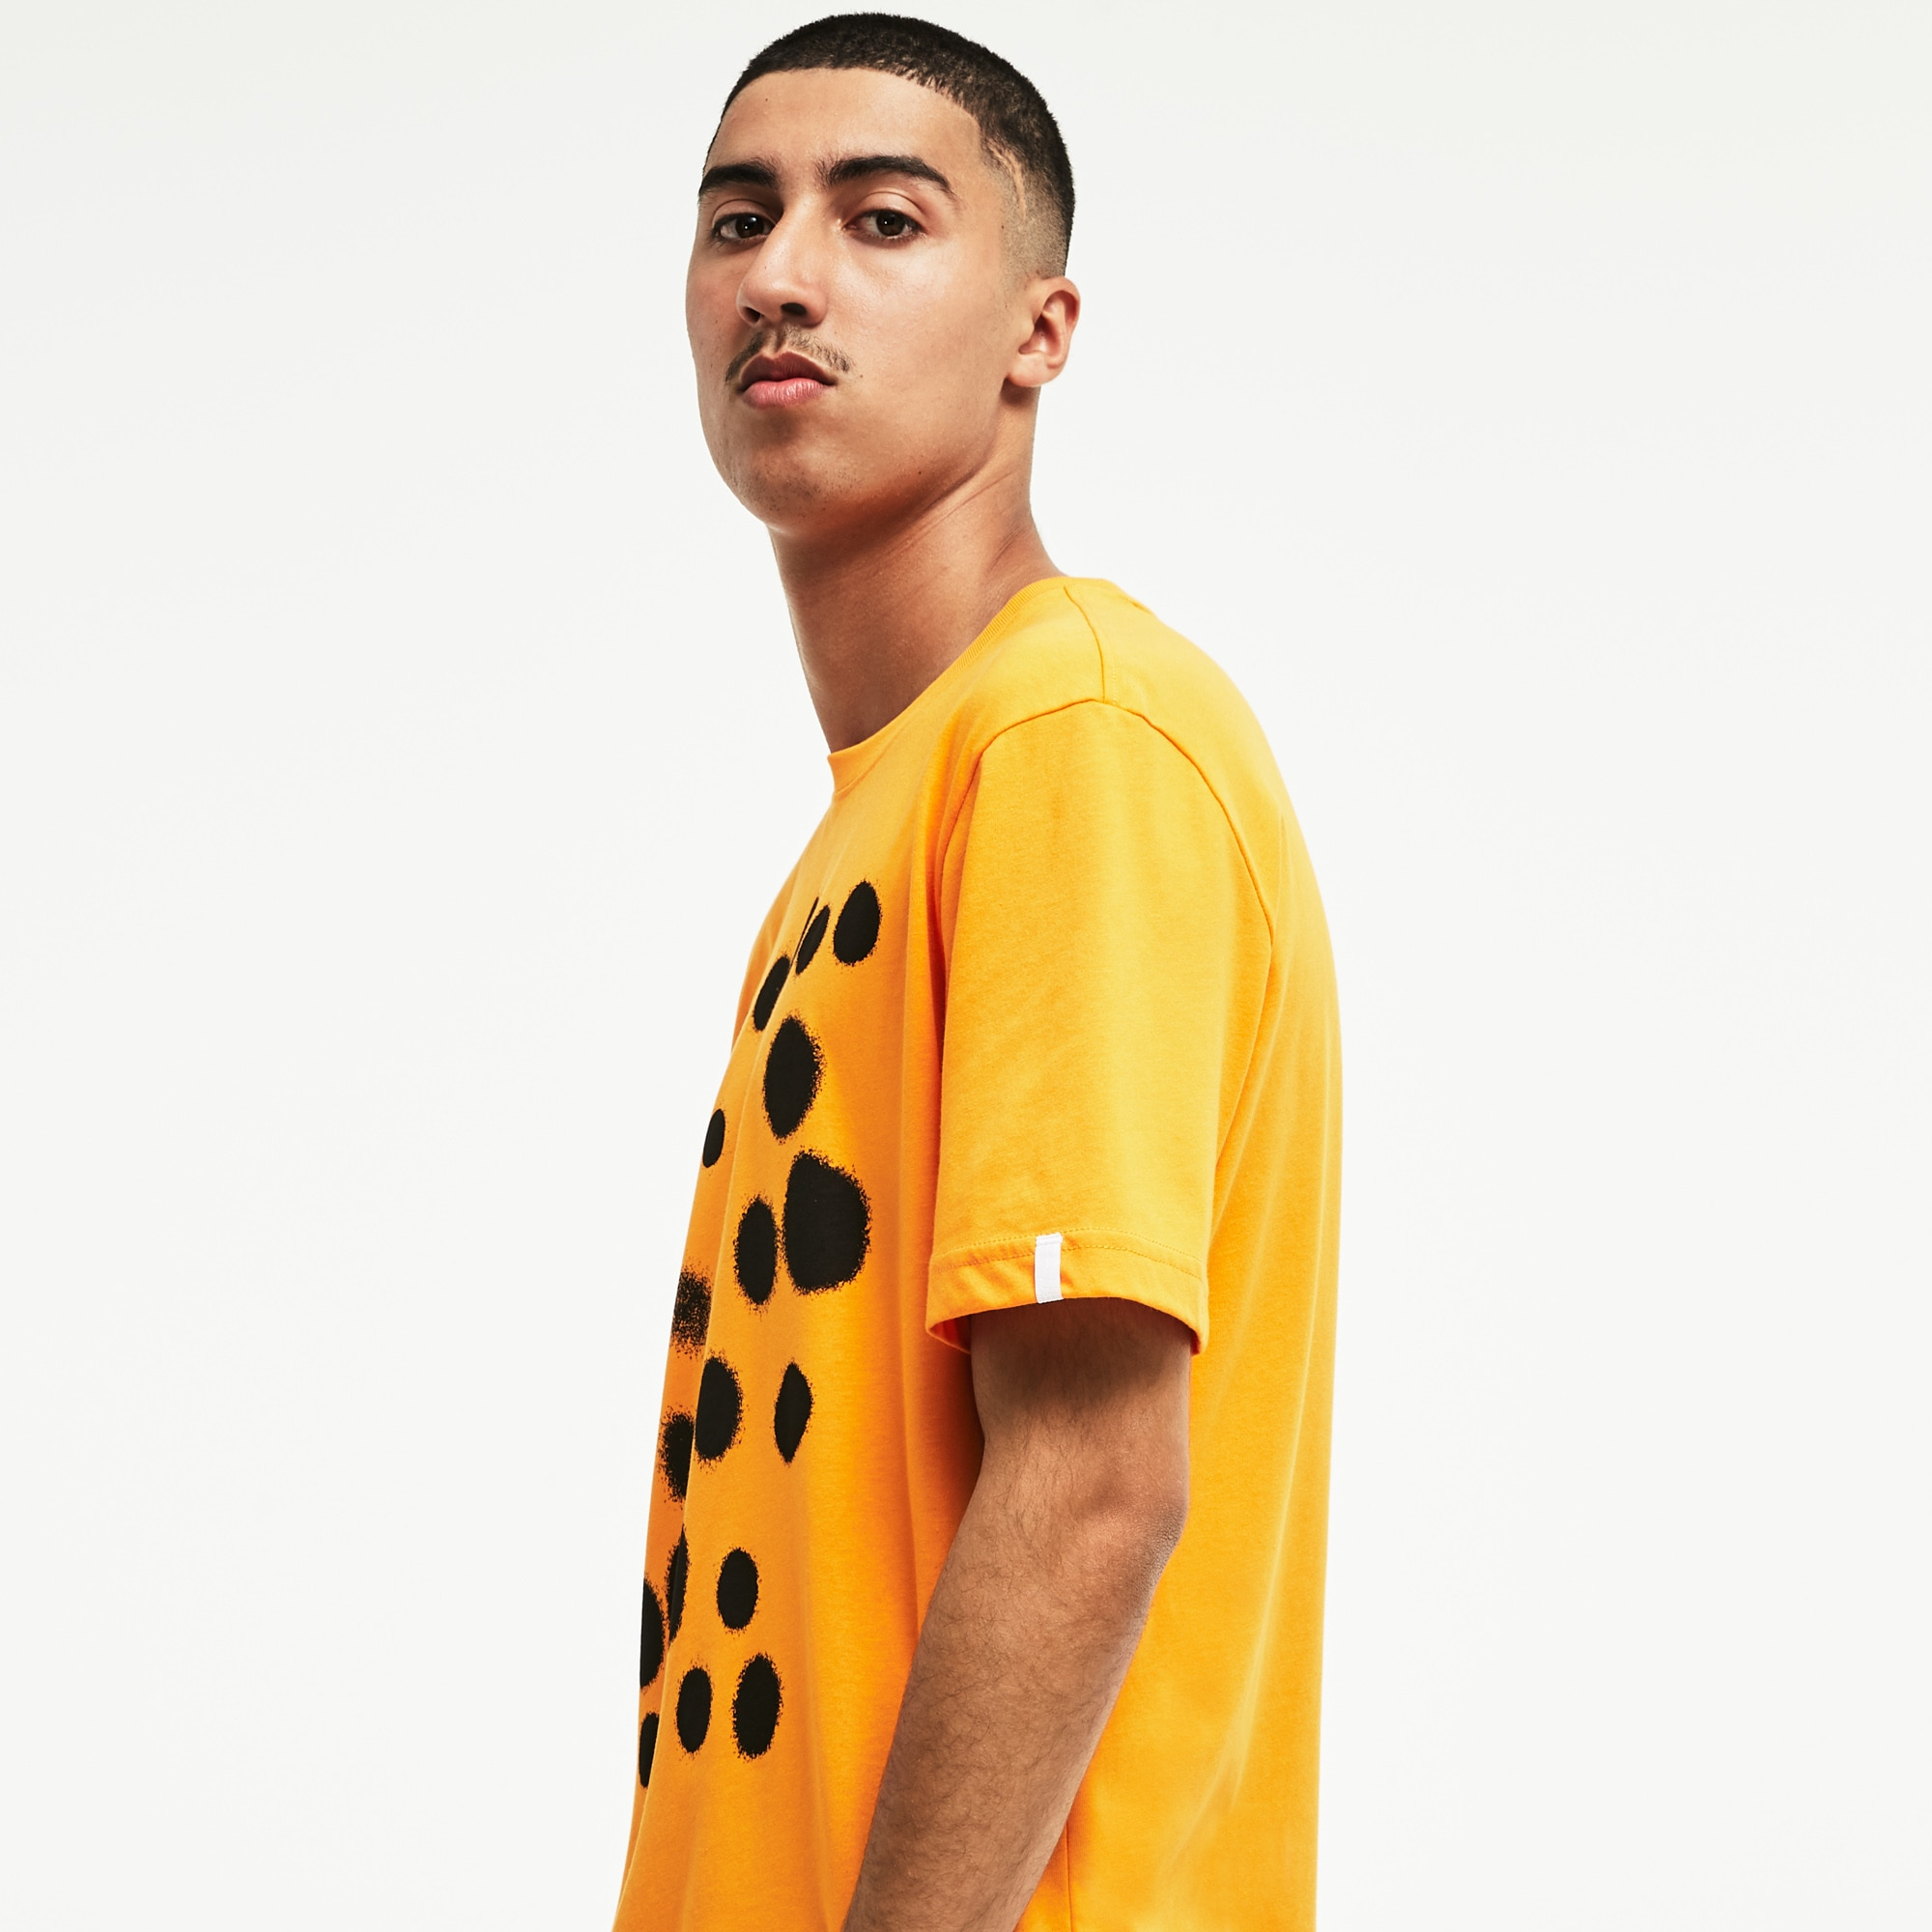 Lacoste LIVE-T-shirt heren ronde hals spuitverfprint jersey